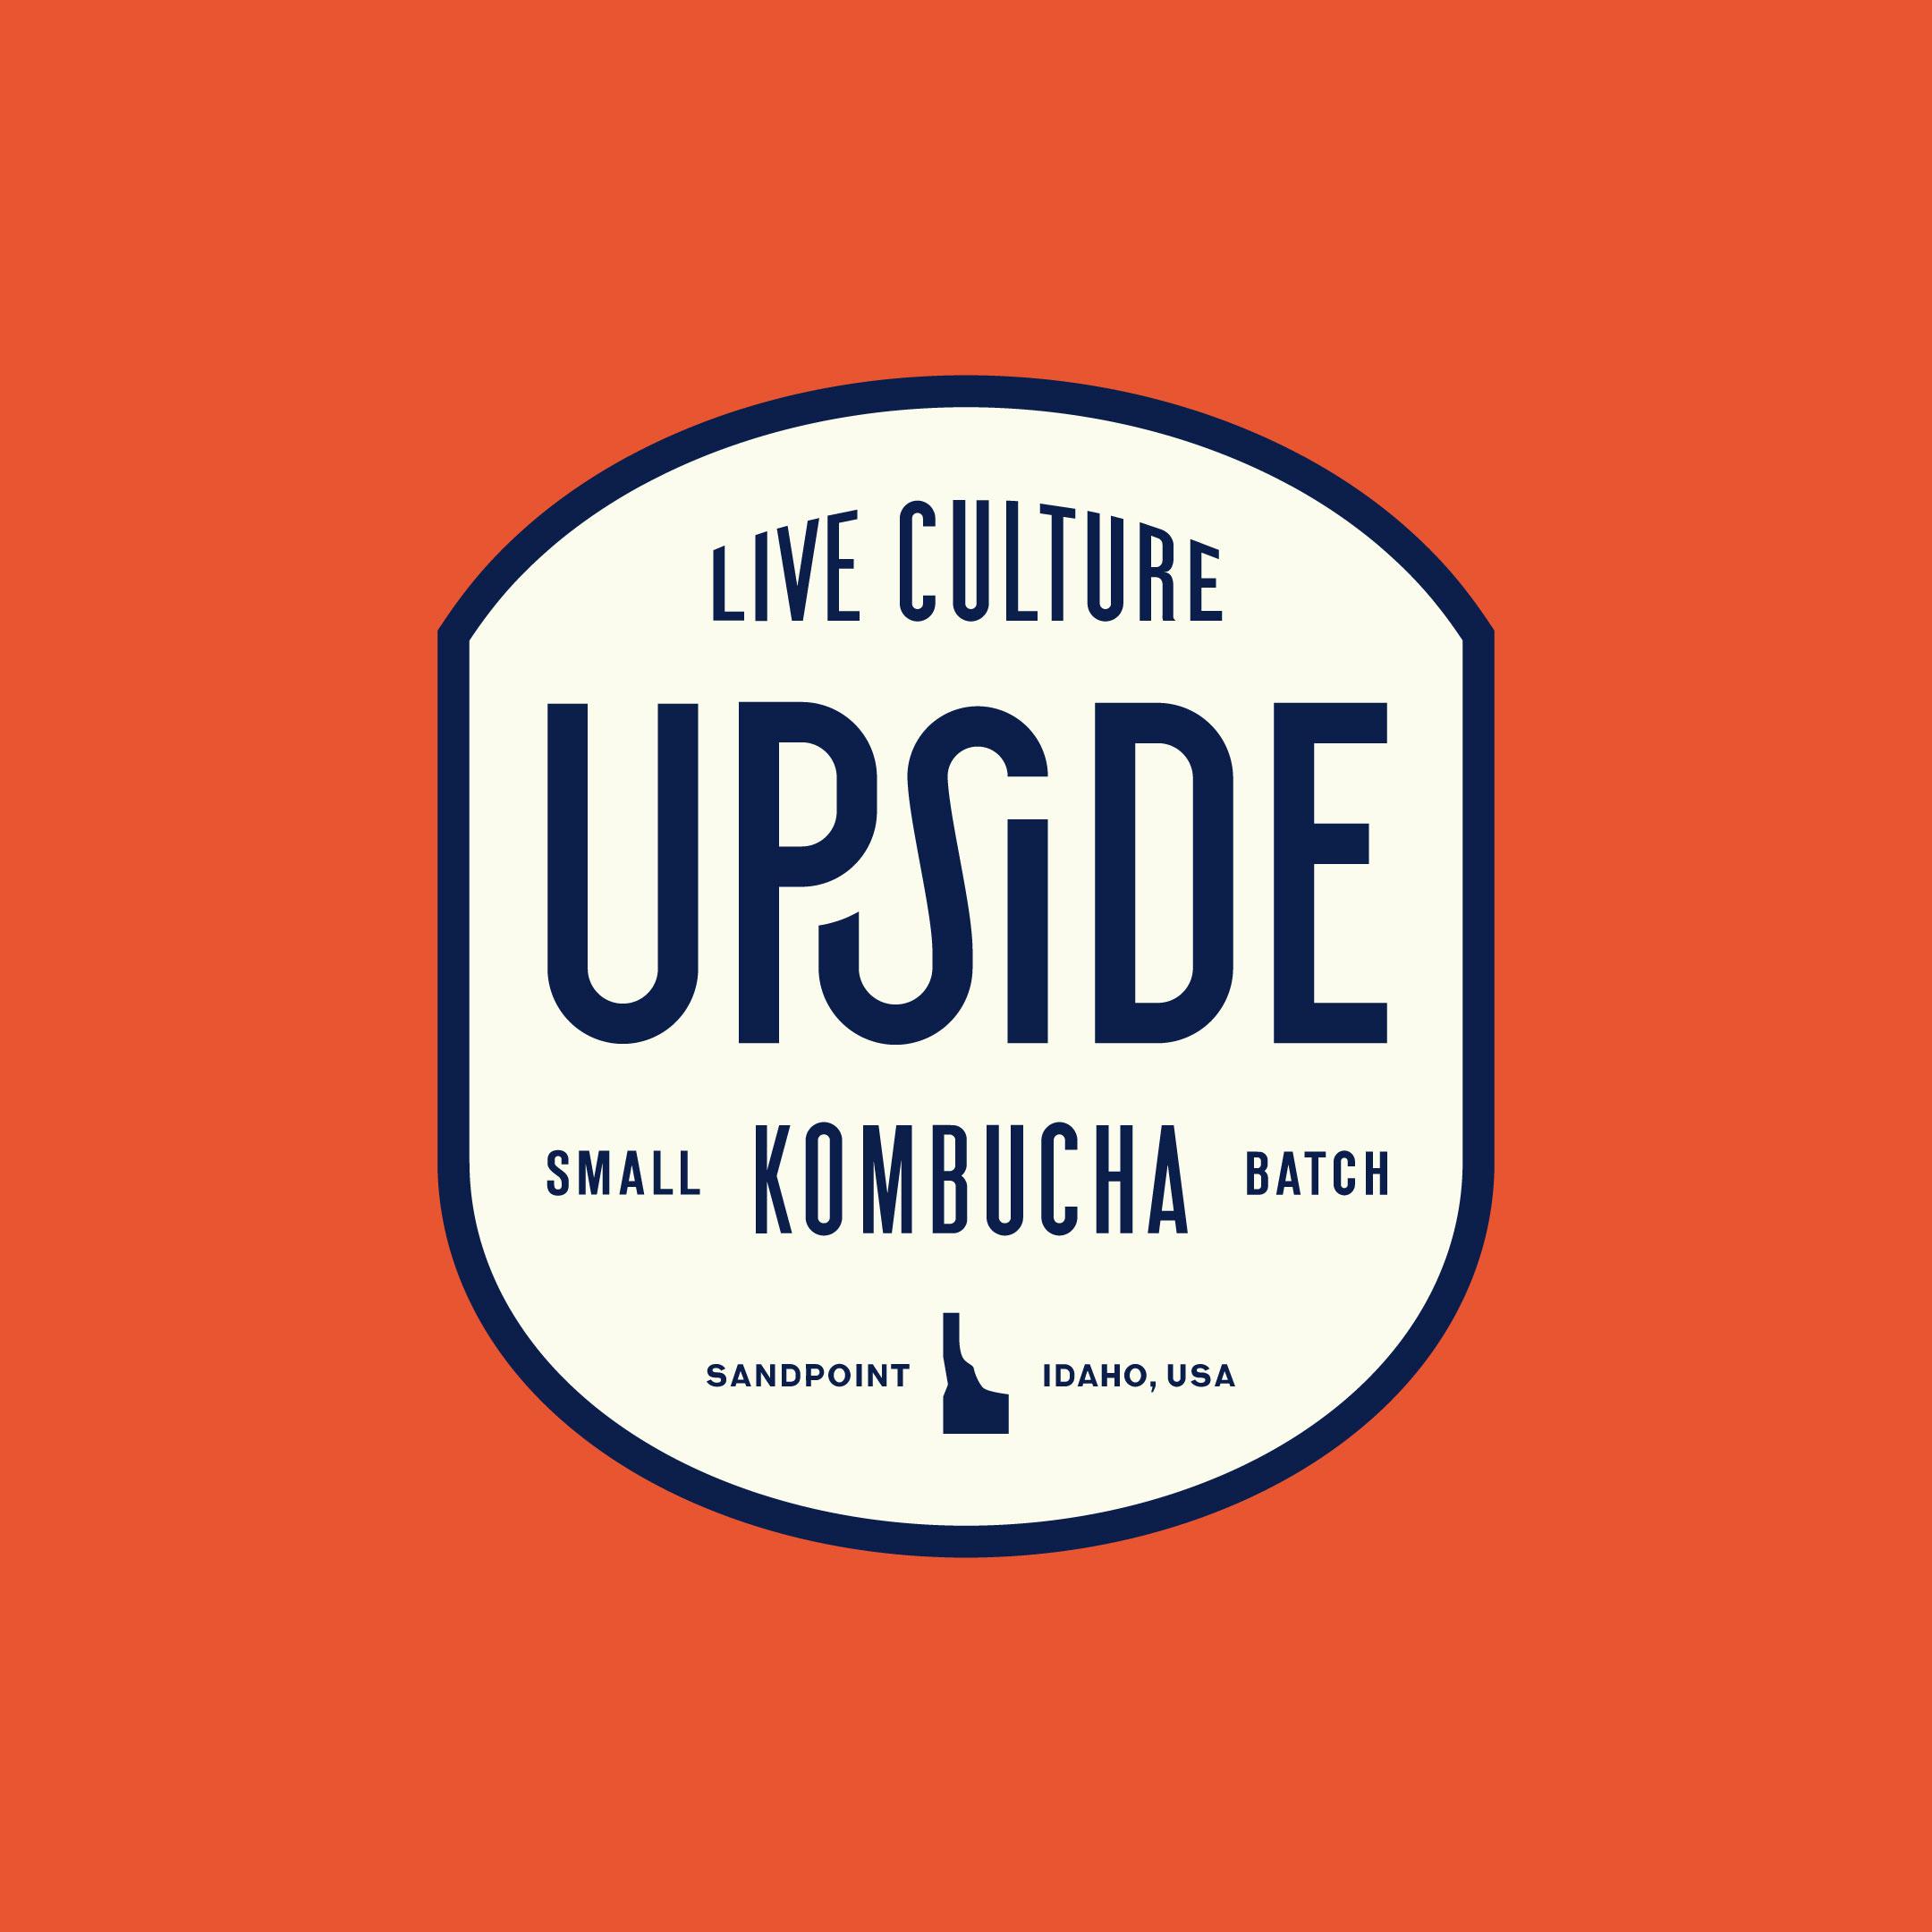 Upside_logo2.jpg